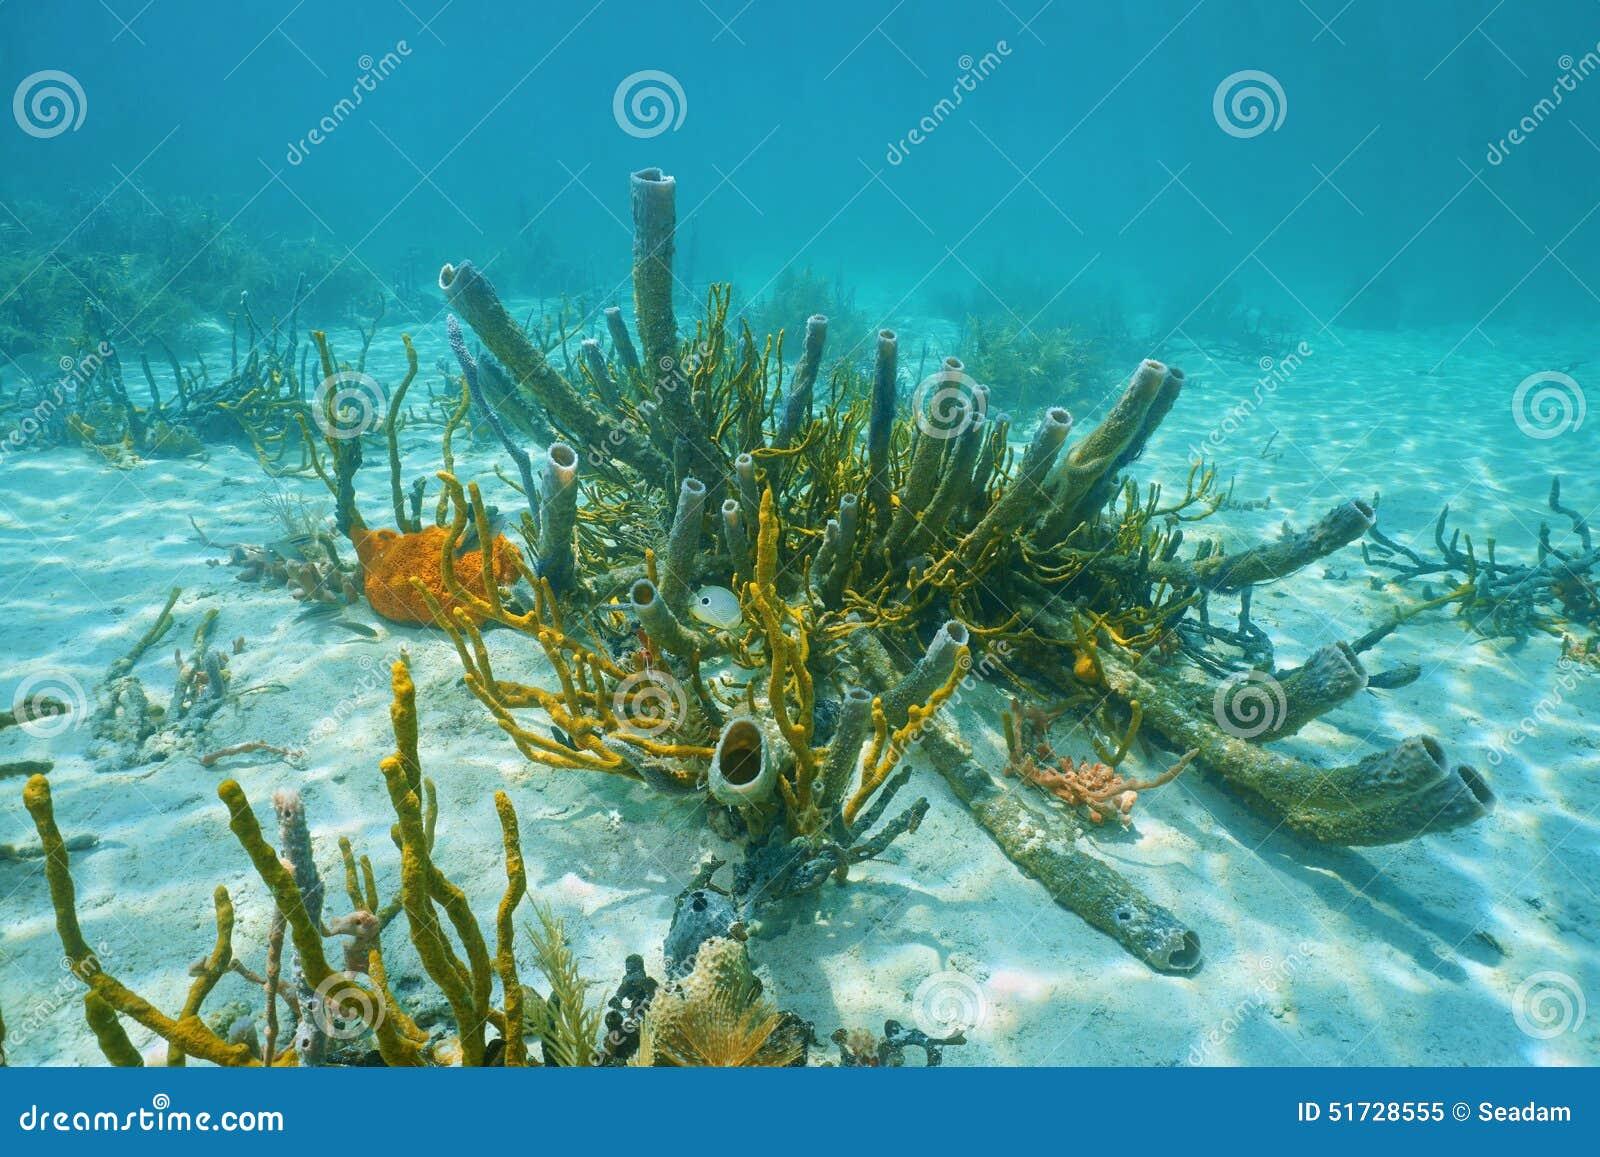 Underwater marine life branching vase sponge